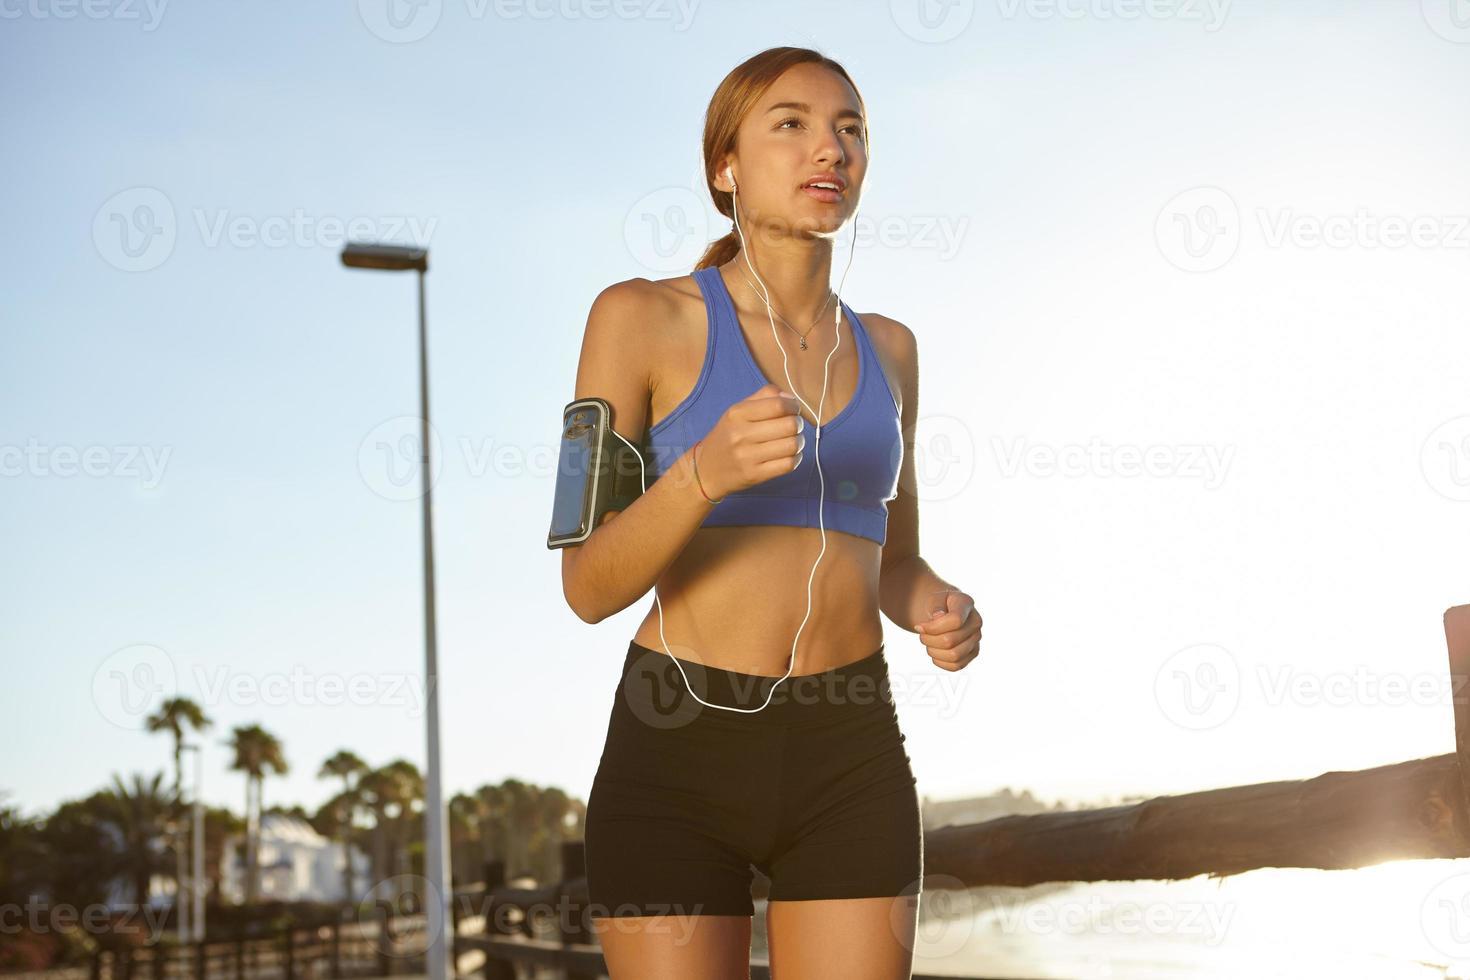 ung jogger som lever en hälsosam livsstil foto